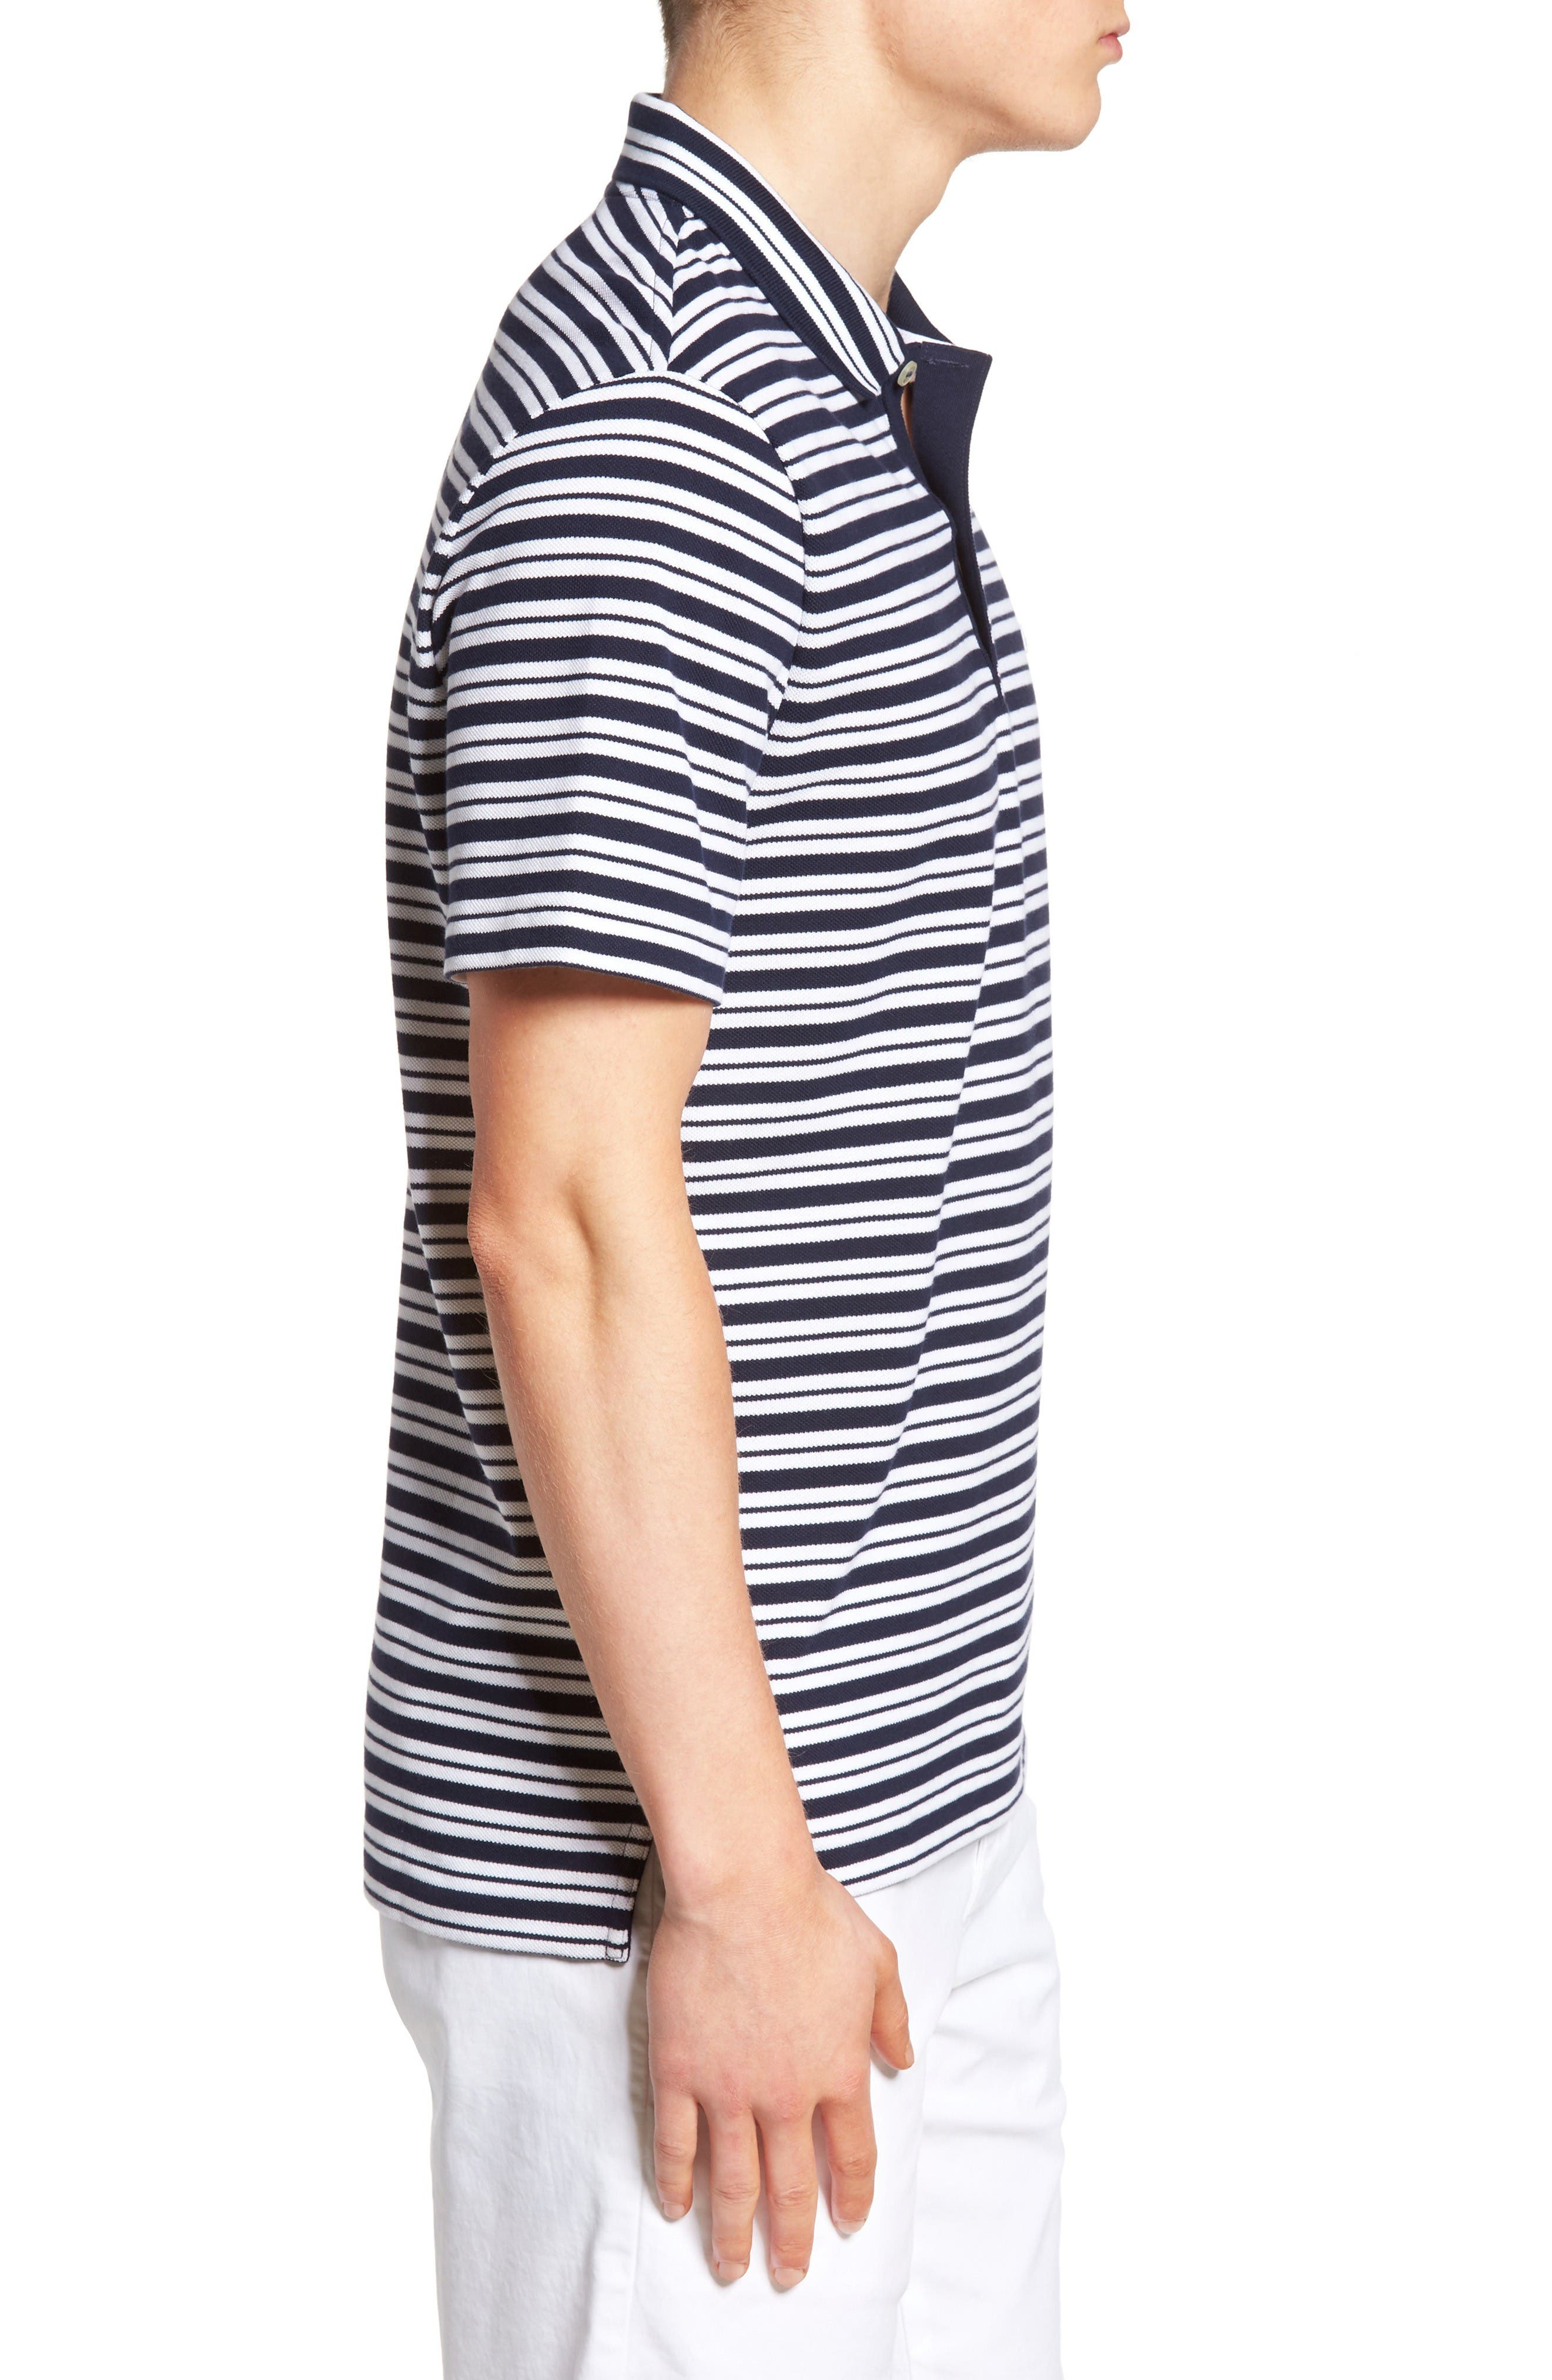 Striped Polo,                             Alternate thumbnail 3, color,                             Navy Blue/ White